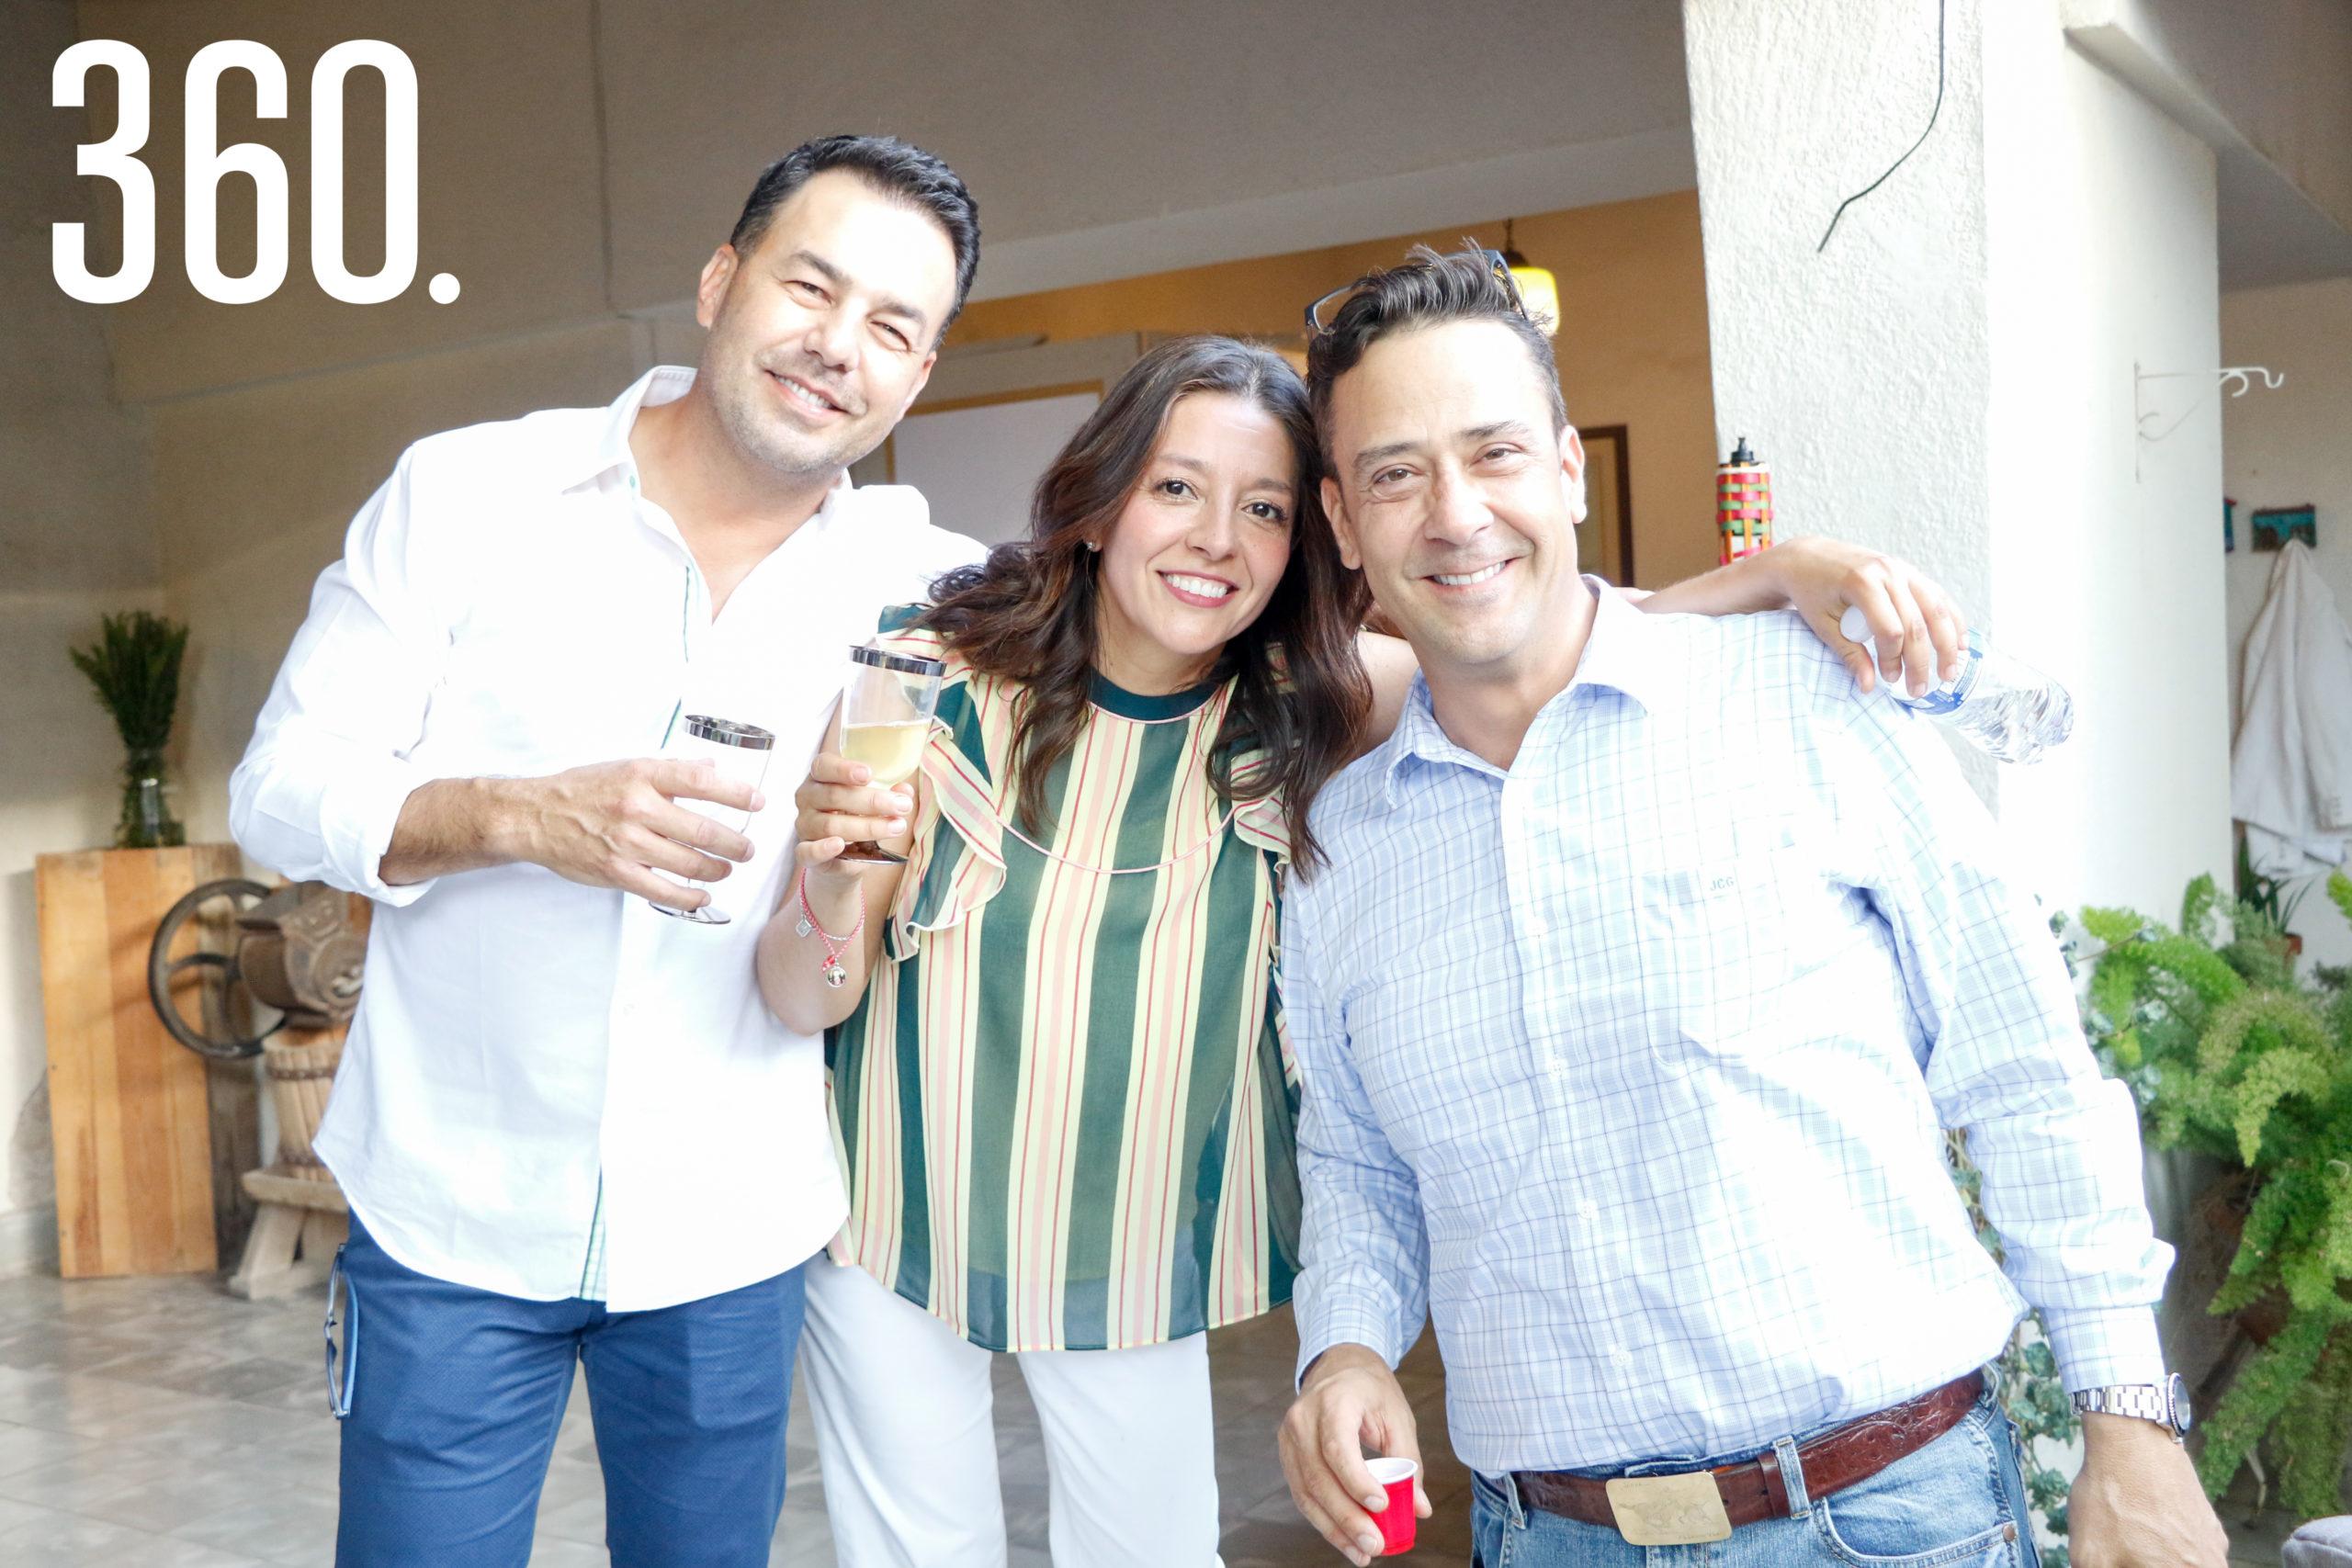 Iván Guerra, Maryté Montes de Oca y Juan Carlos Guerra.